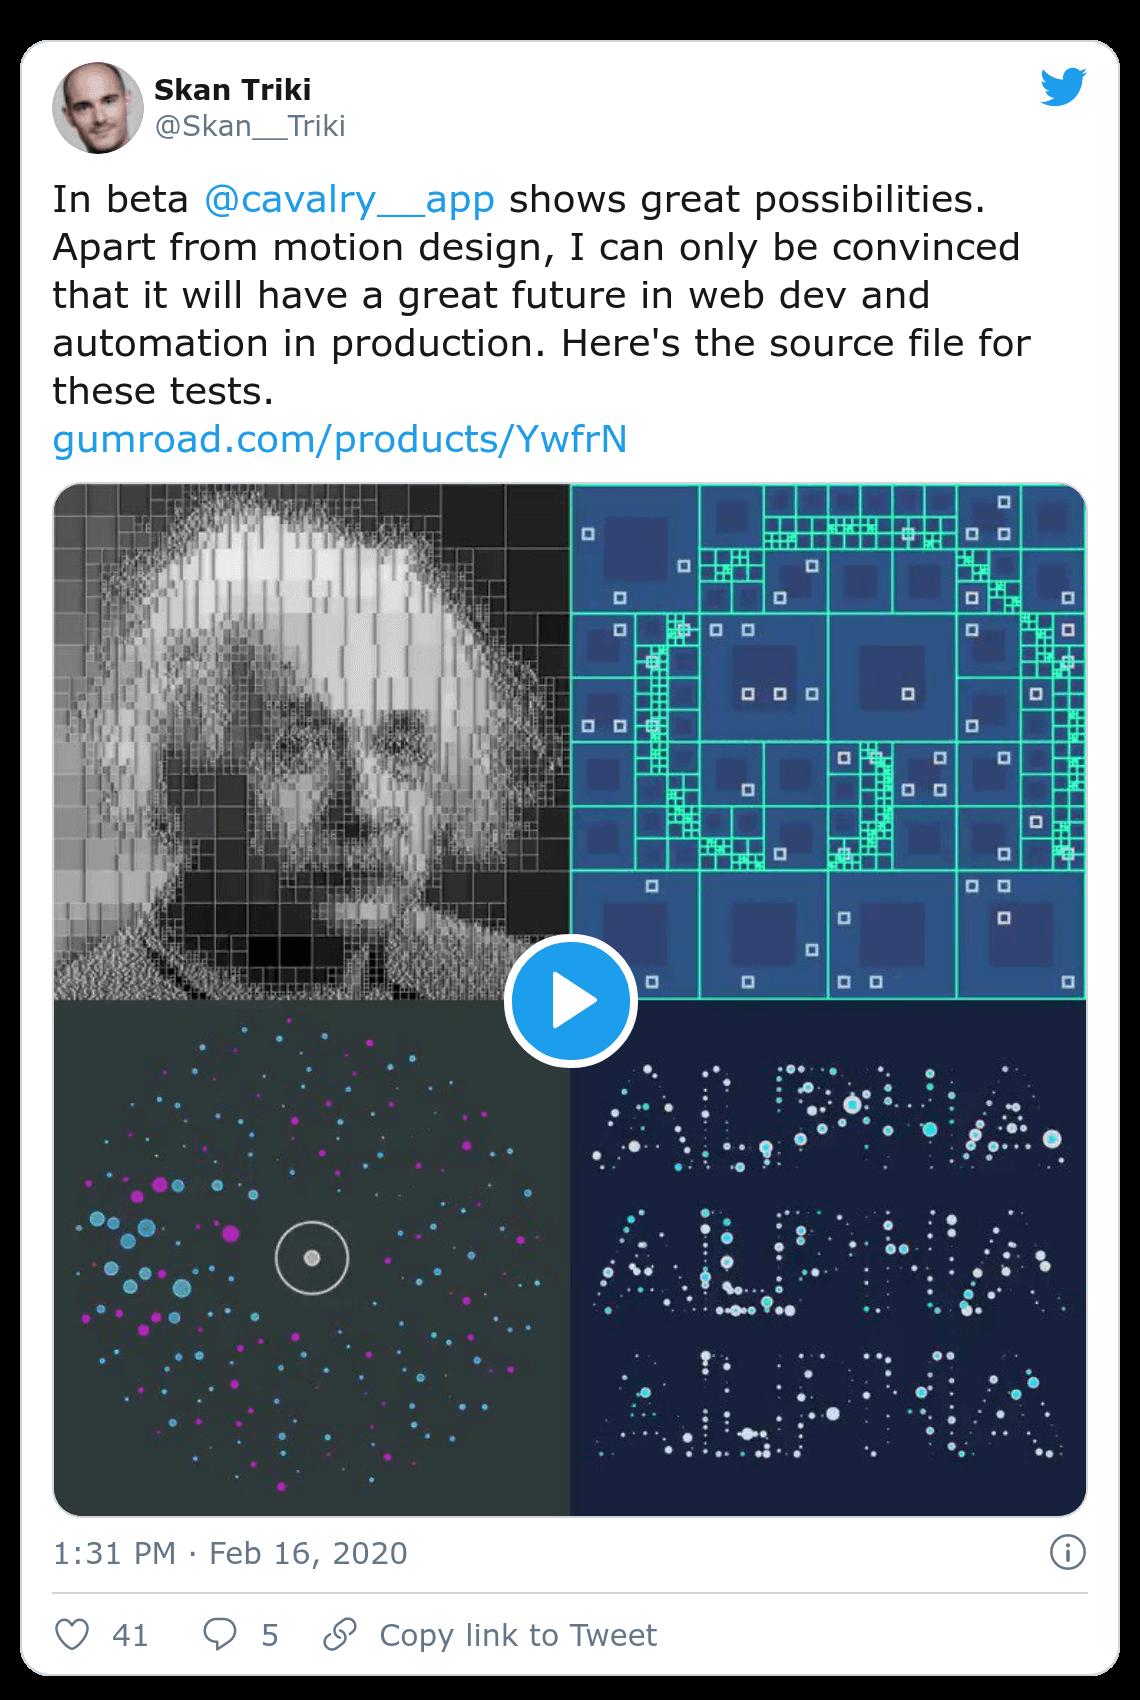 Screenshot of Skan Triki tweet about procedural animation in Cavalry